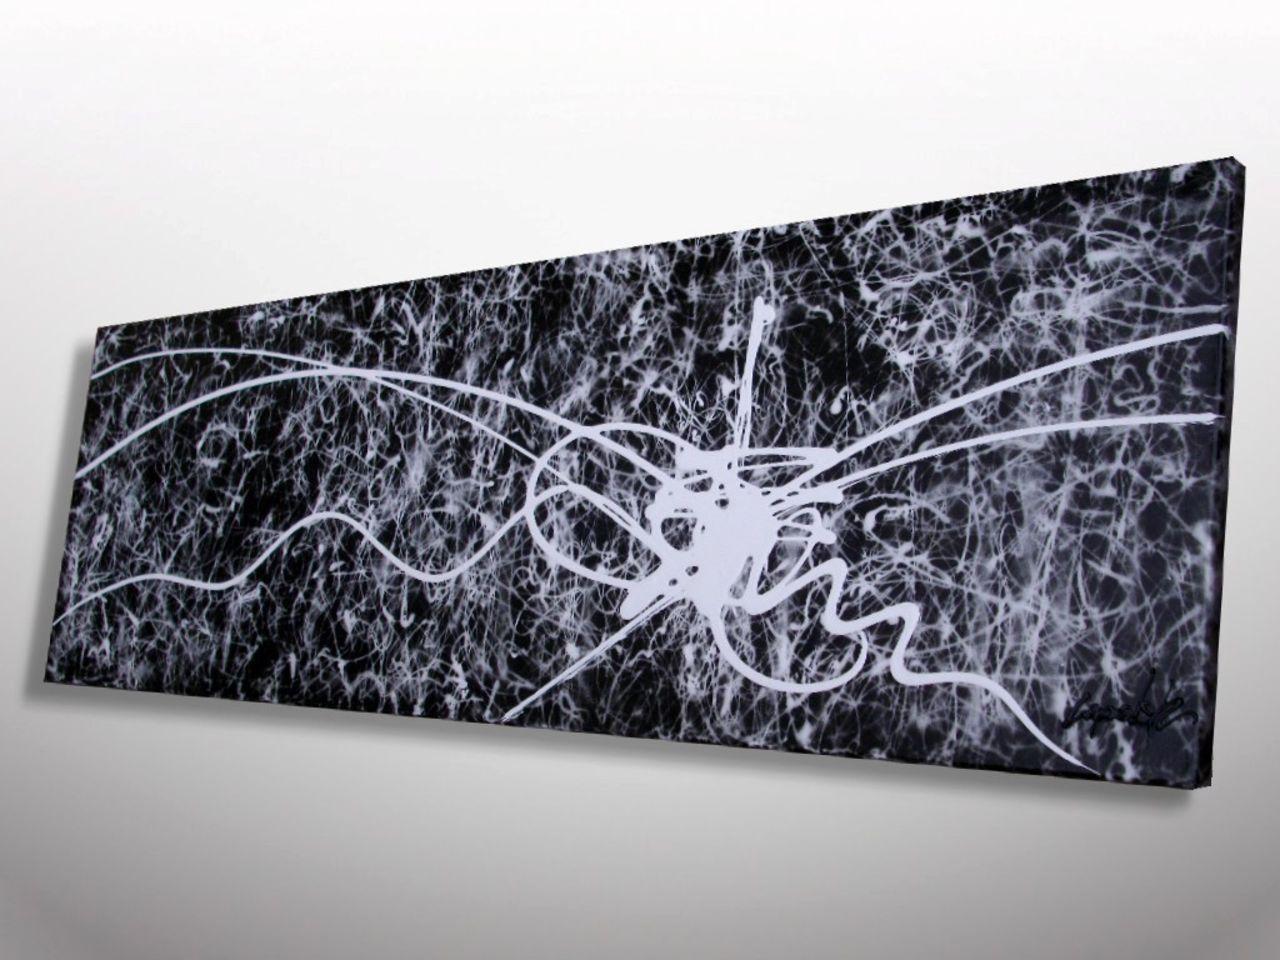 MISTER K  (Lepolsk Matuszewski) X-RAY  Expressionnisme abstrait contemporain